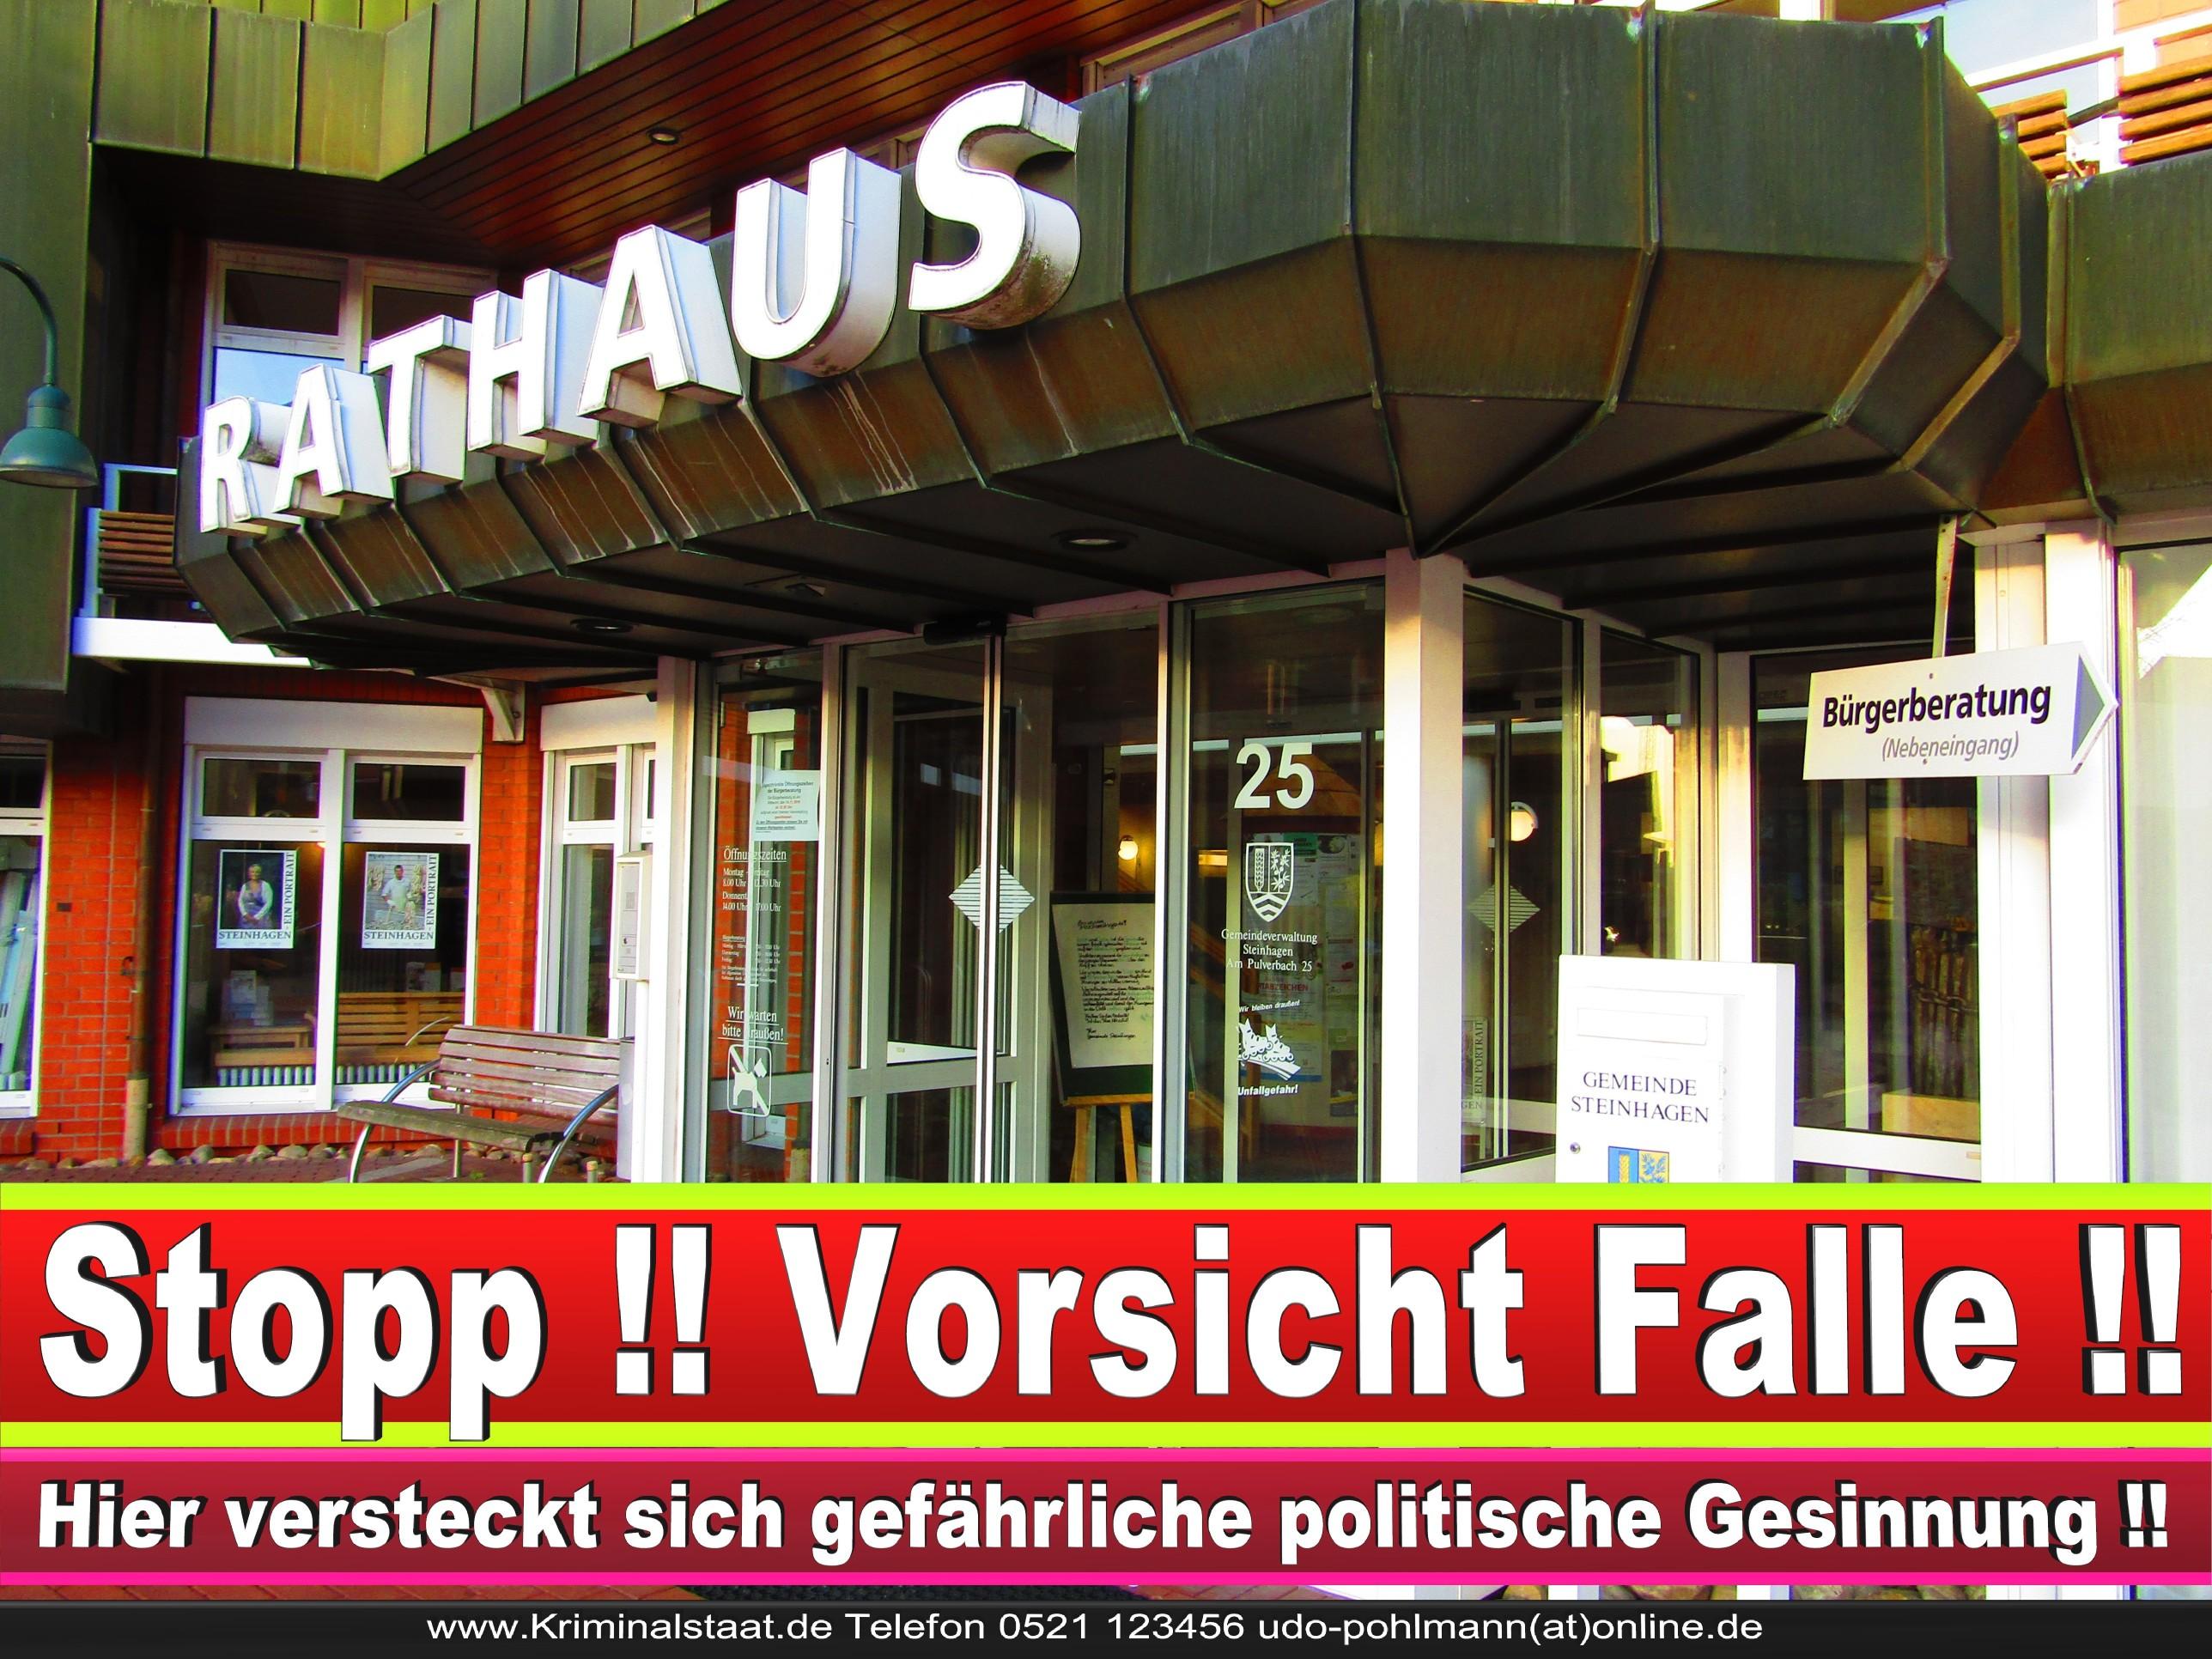 Rathaus Steinhagen CDU SPD FDP Ortsverband CDU Bürgerbüro CDU SPD Korruption Polizei Bürgermeister Karte Telefonbuch NRW OWL (13)